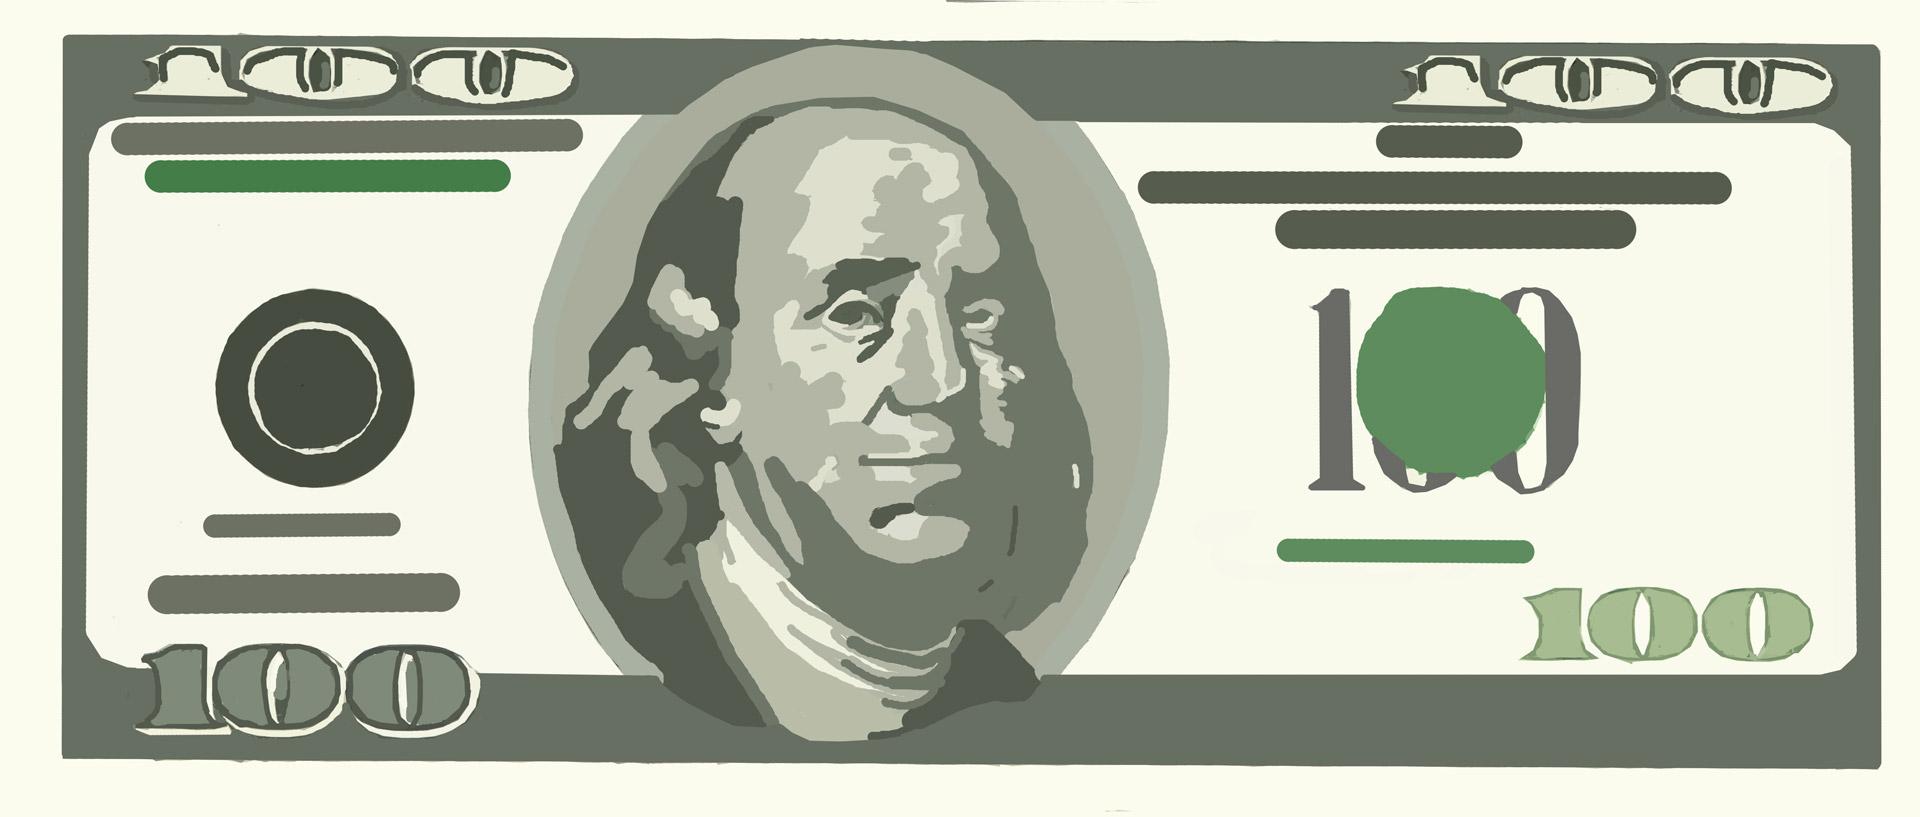 Free $100 Bill Cliparts, Download Free Clip Art, Free Clip.